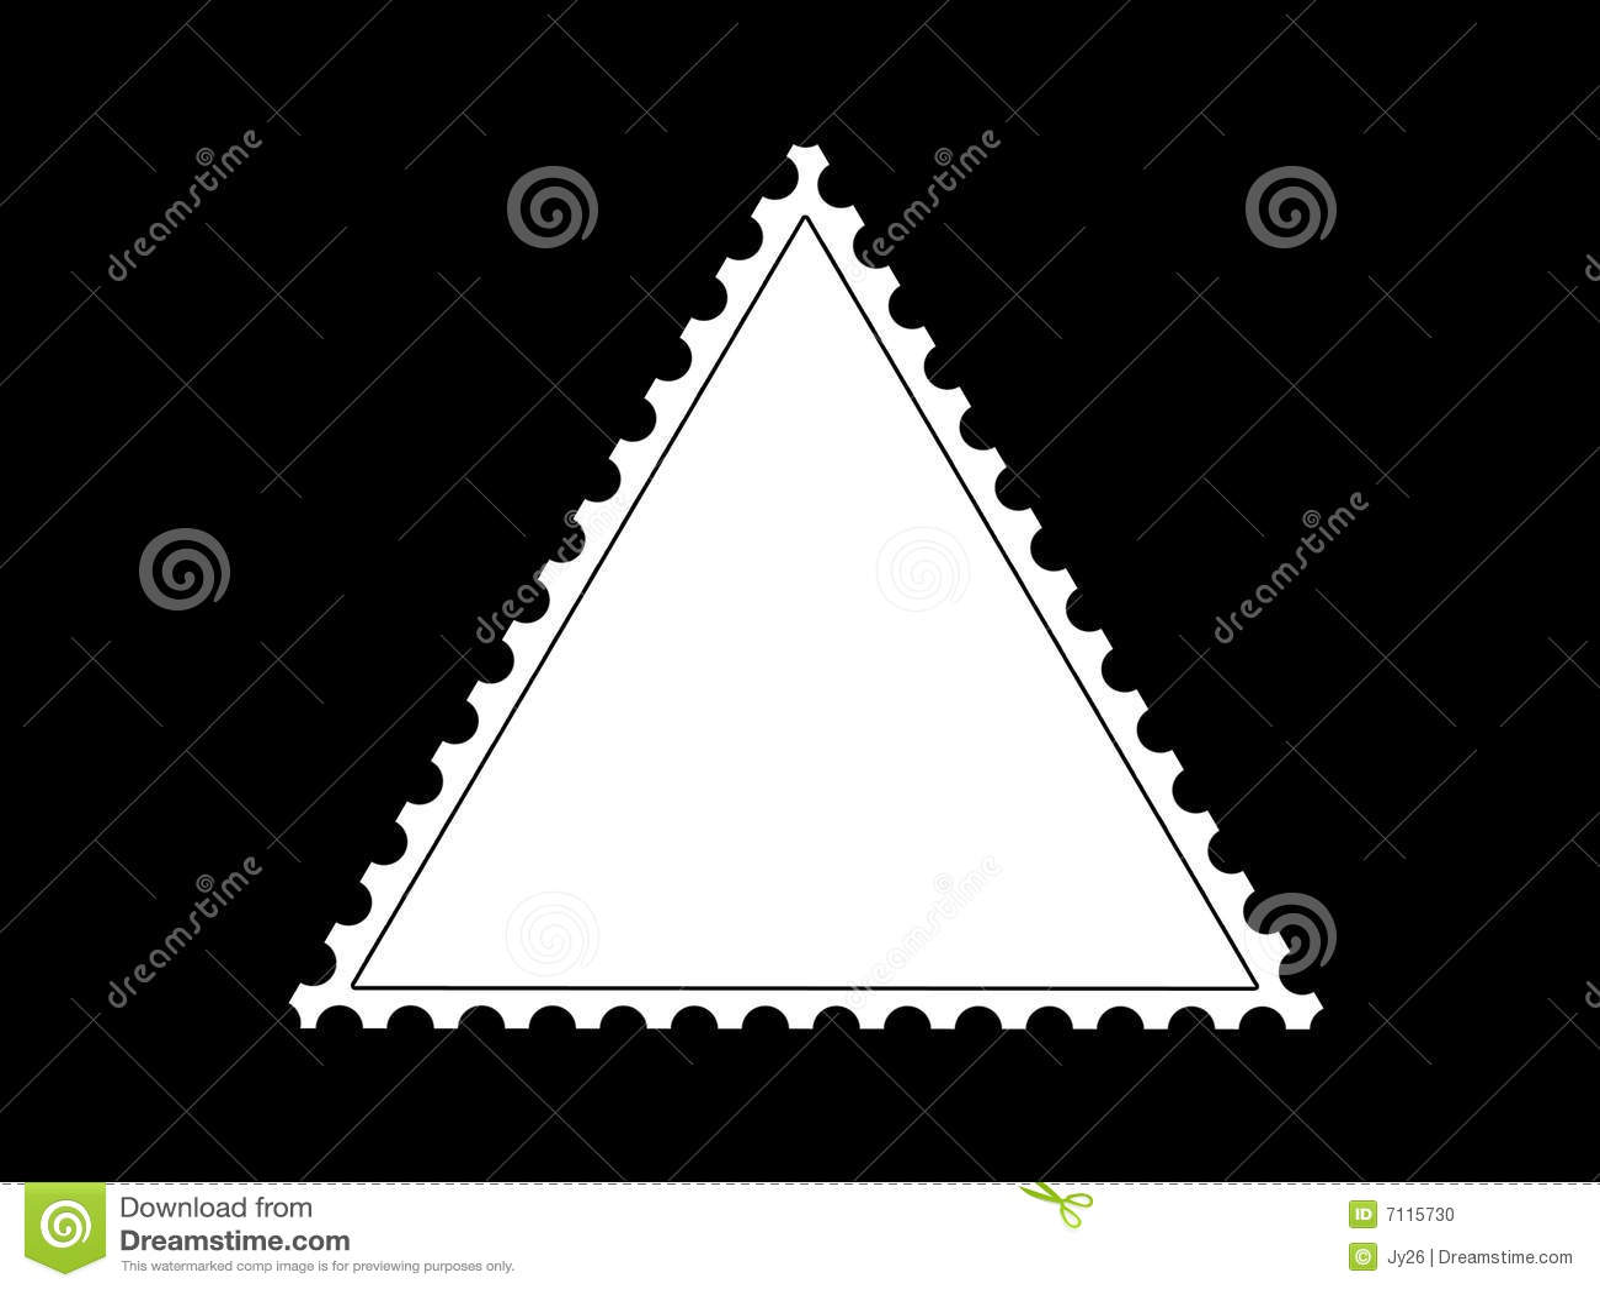 triangle shape postage stamp frame